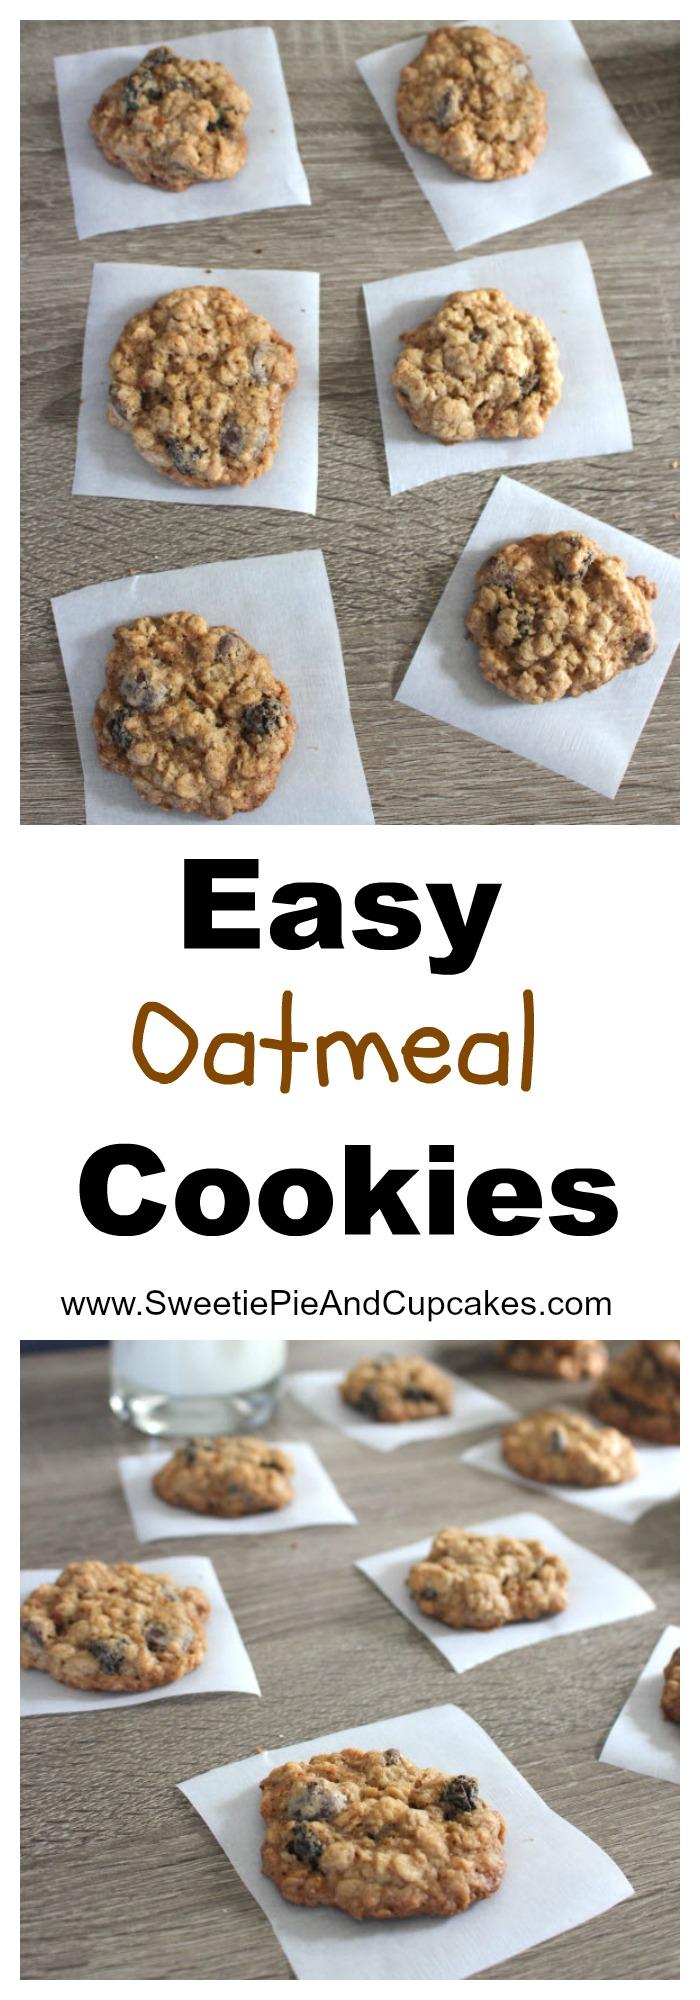 Easy Oatmeal Cookies Pin